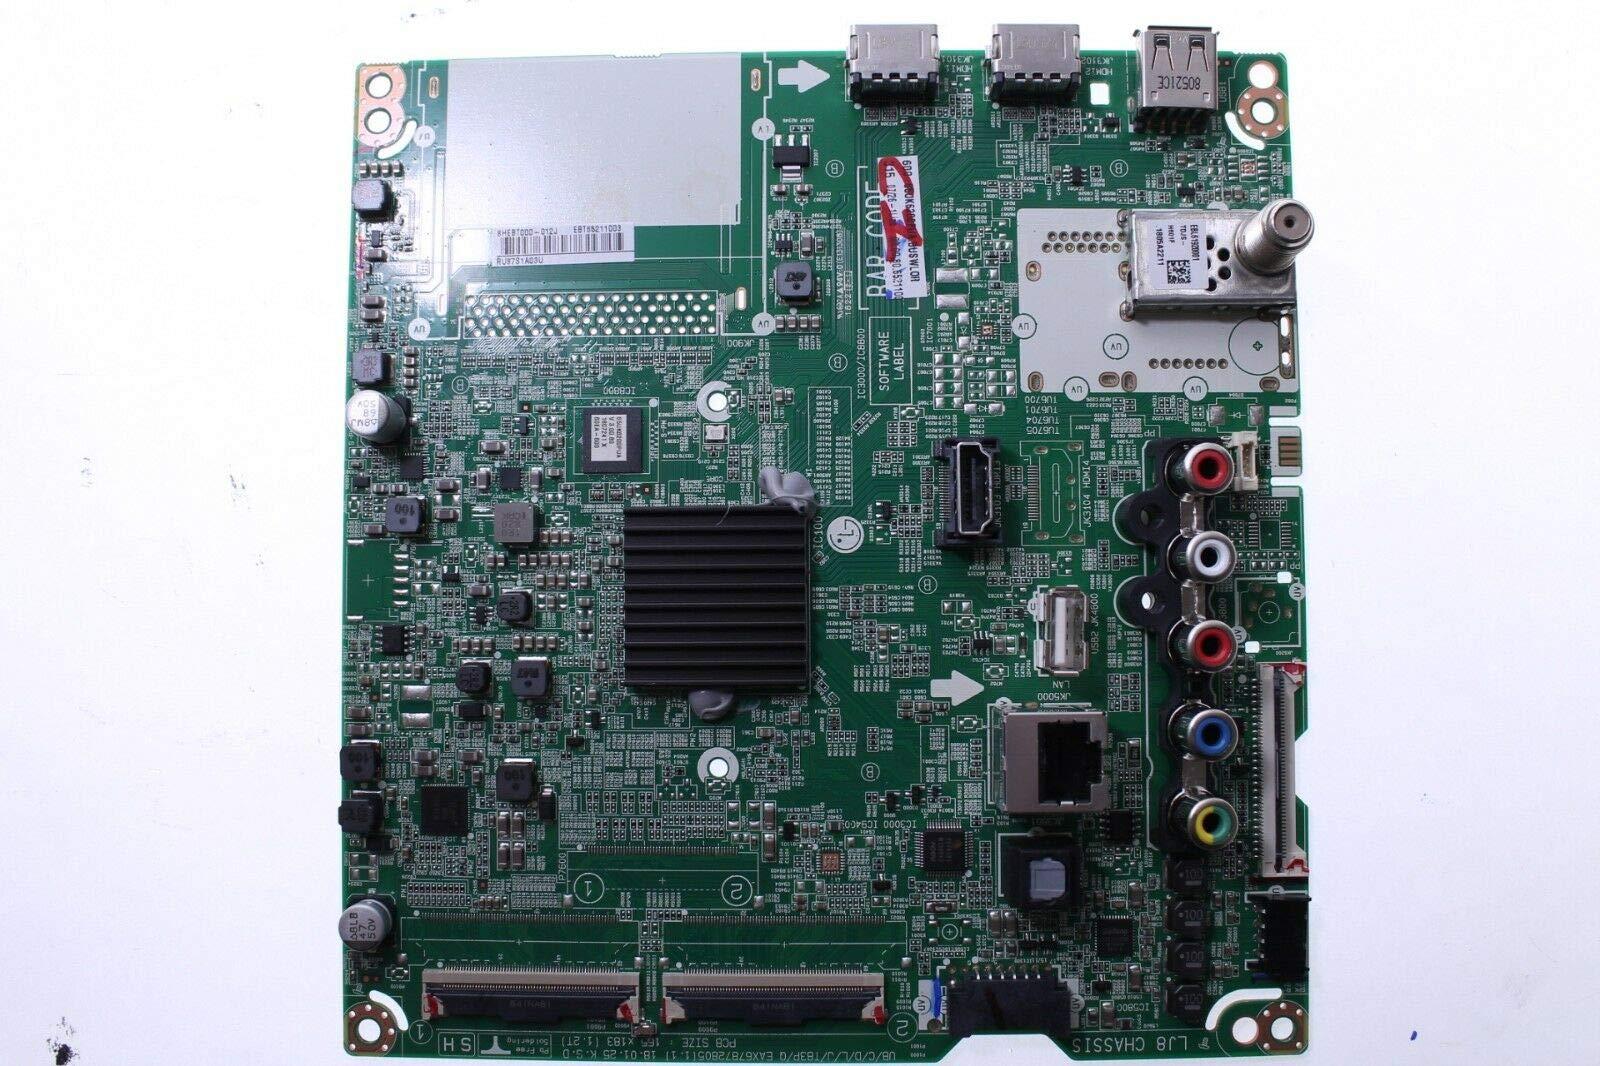 LG EBT65211003 Main Board for Service Code 65UK6200PUA.BUSWLOR by Mod Freakz